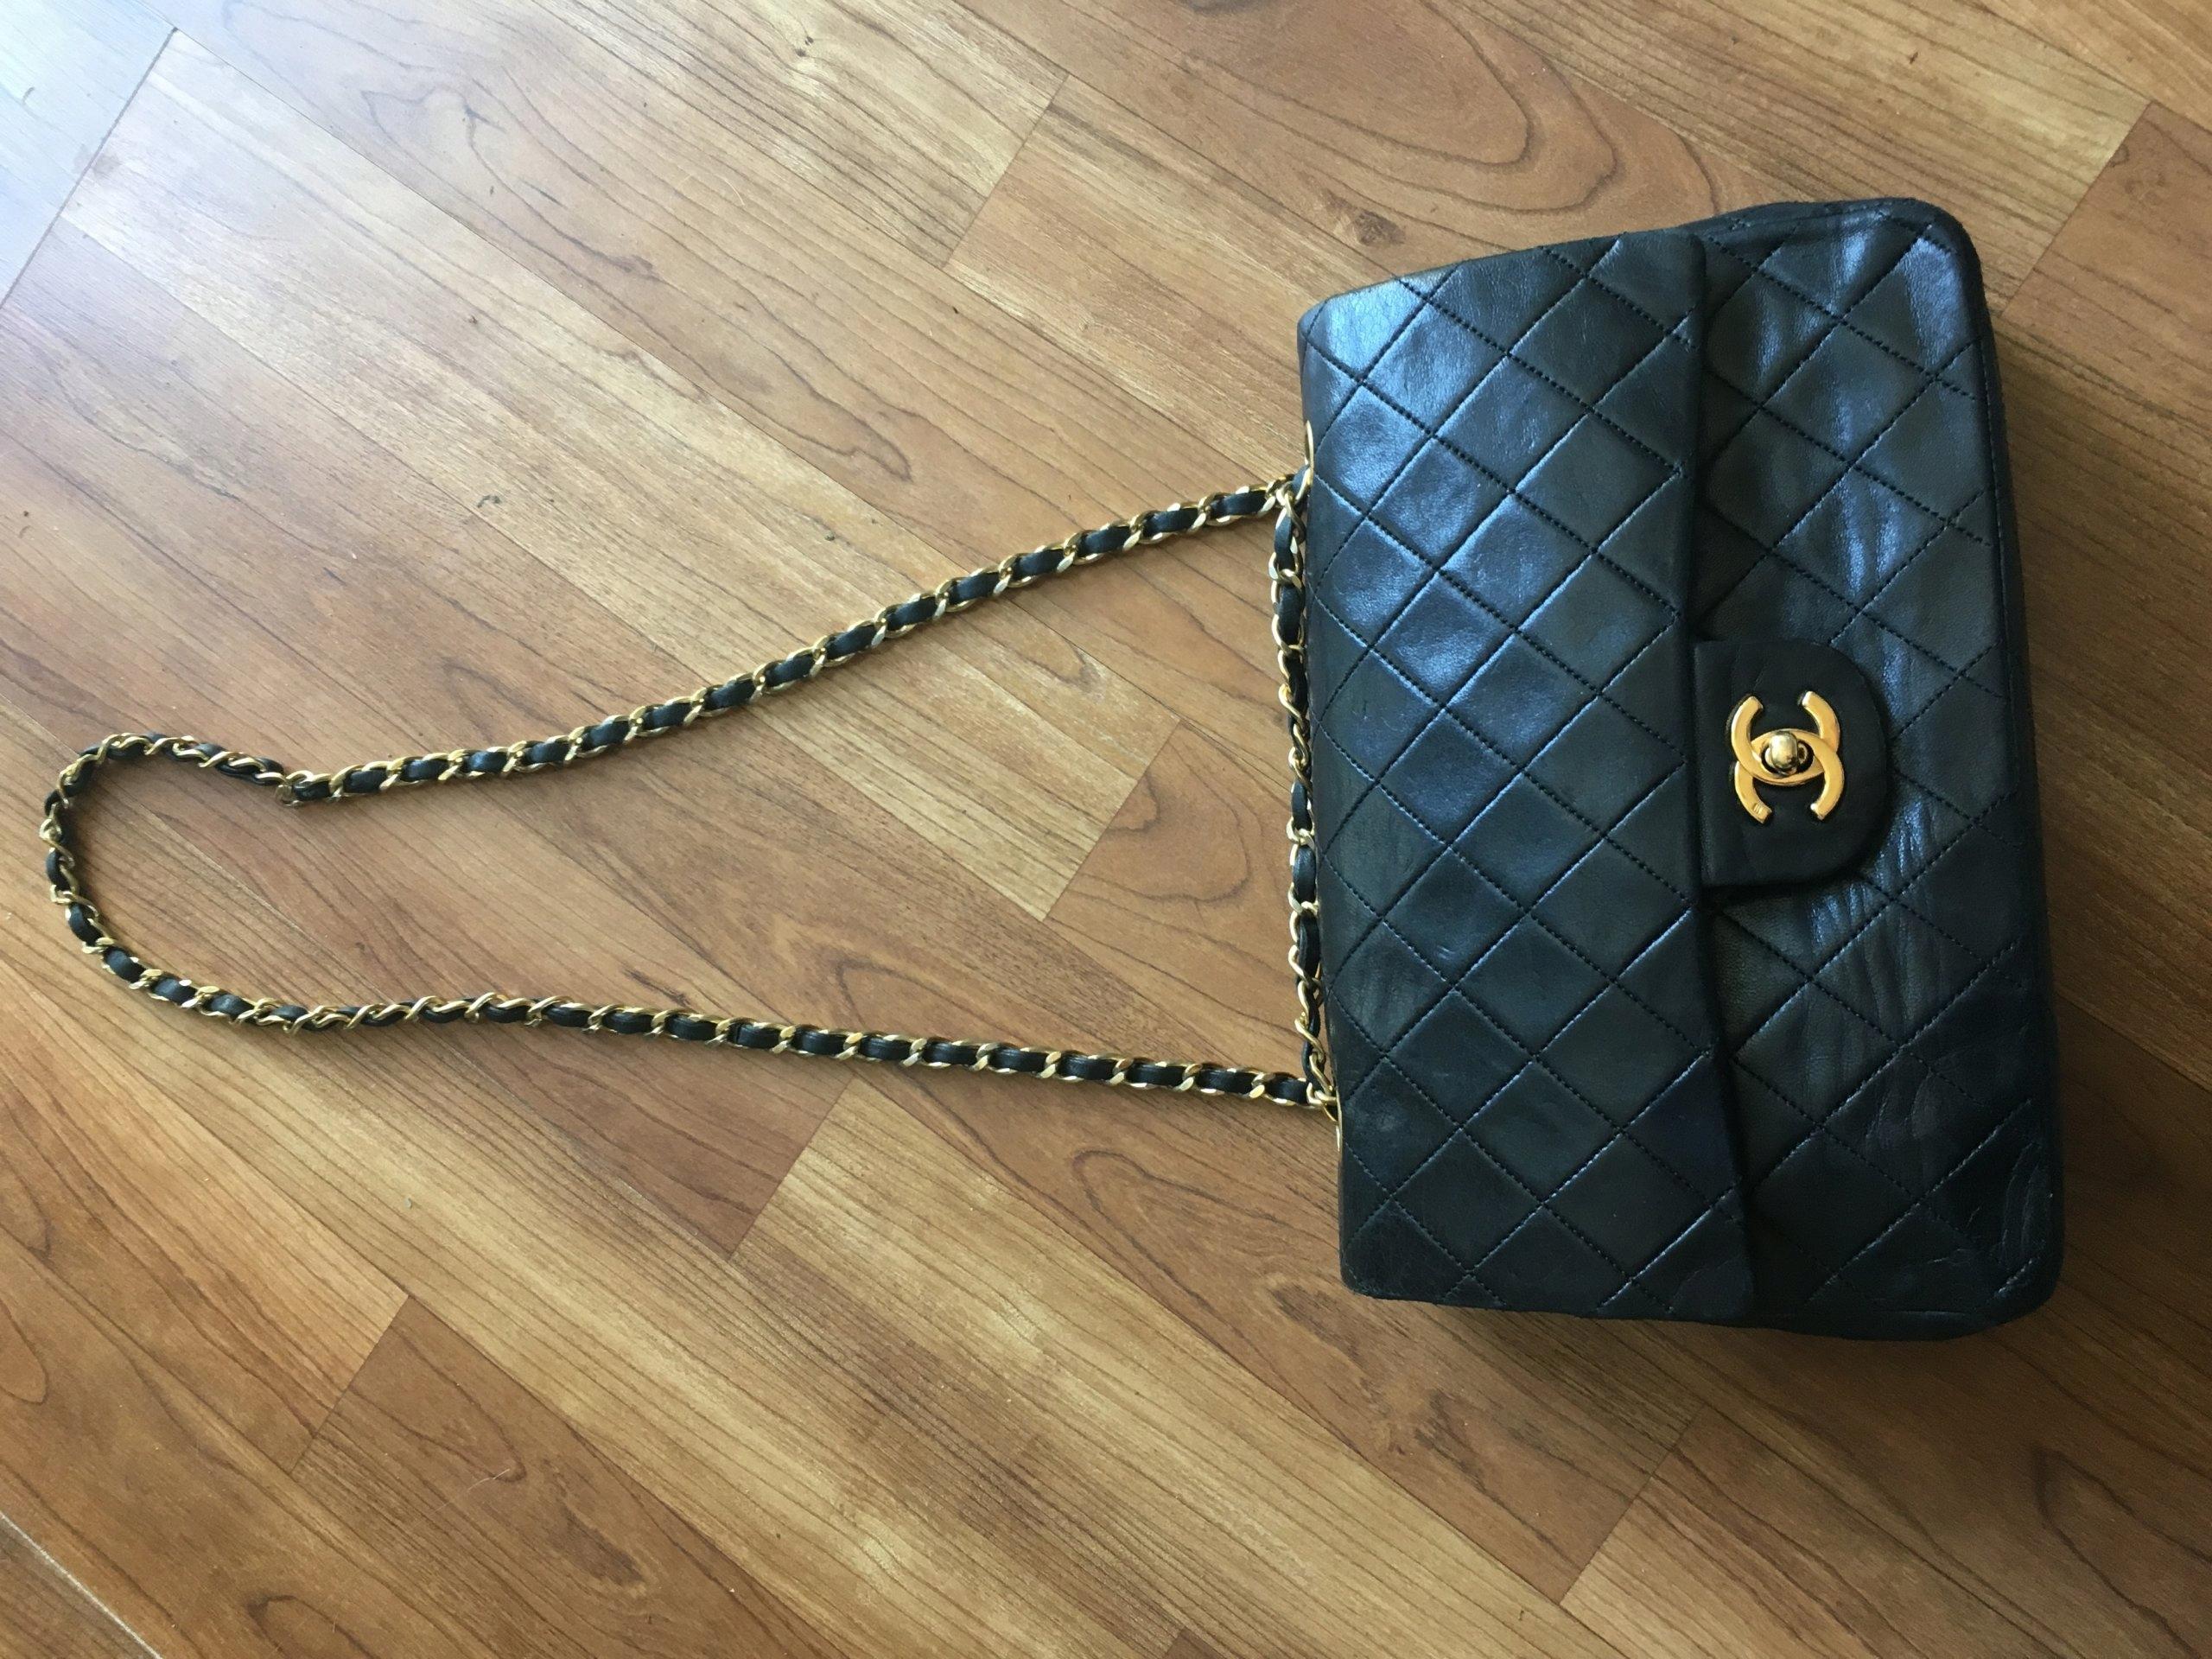 15fc4da1ac7f5 Chanel 2.55 double flap bag torebka klasyczna - 7507014664 ...